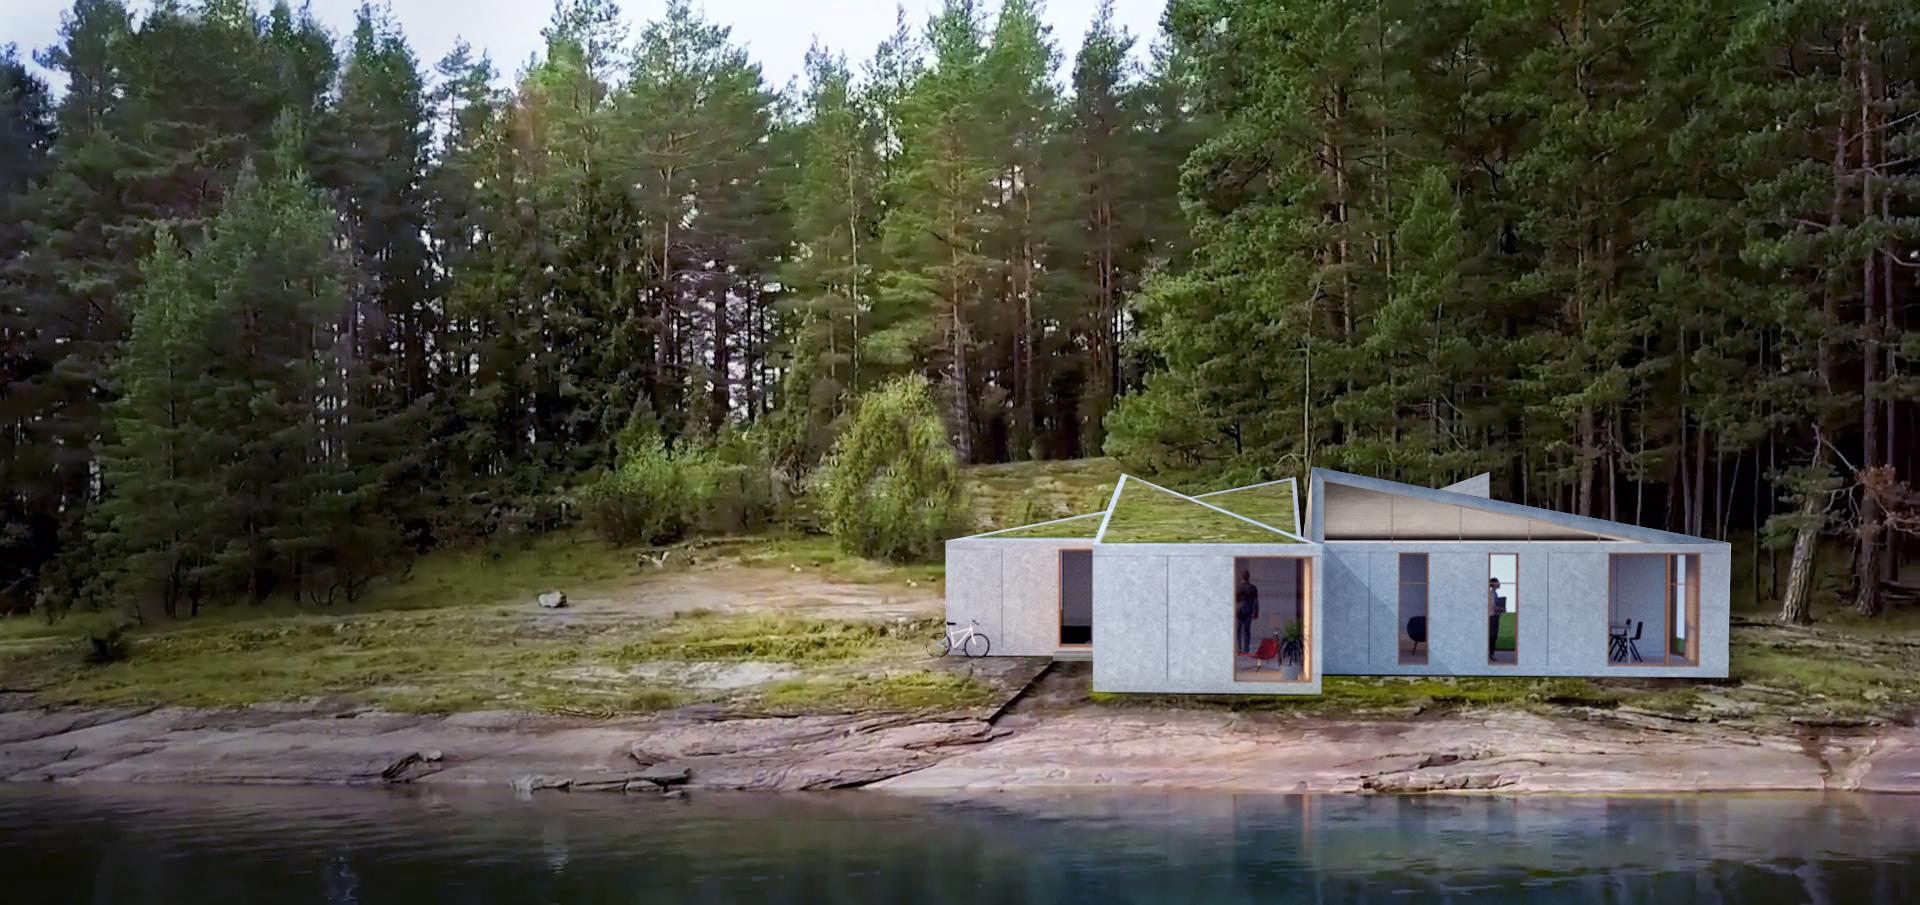 sastudio tiago sá origami sustainable house casais architecture arquitetura